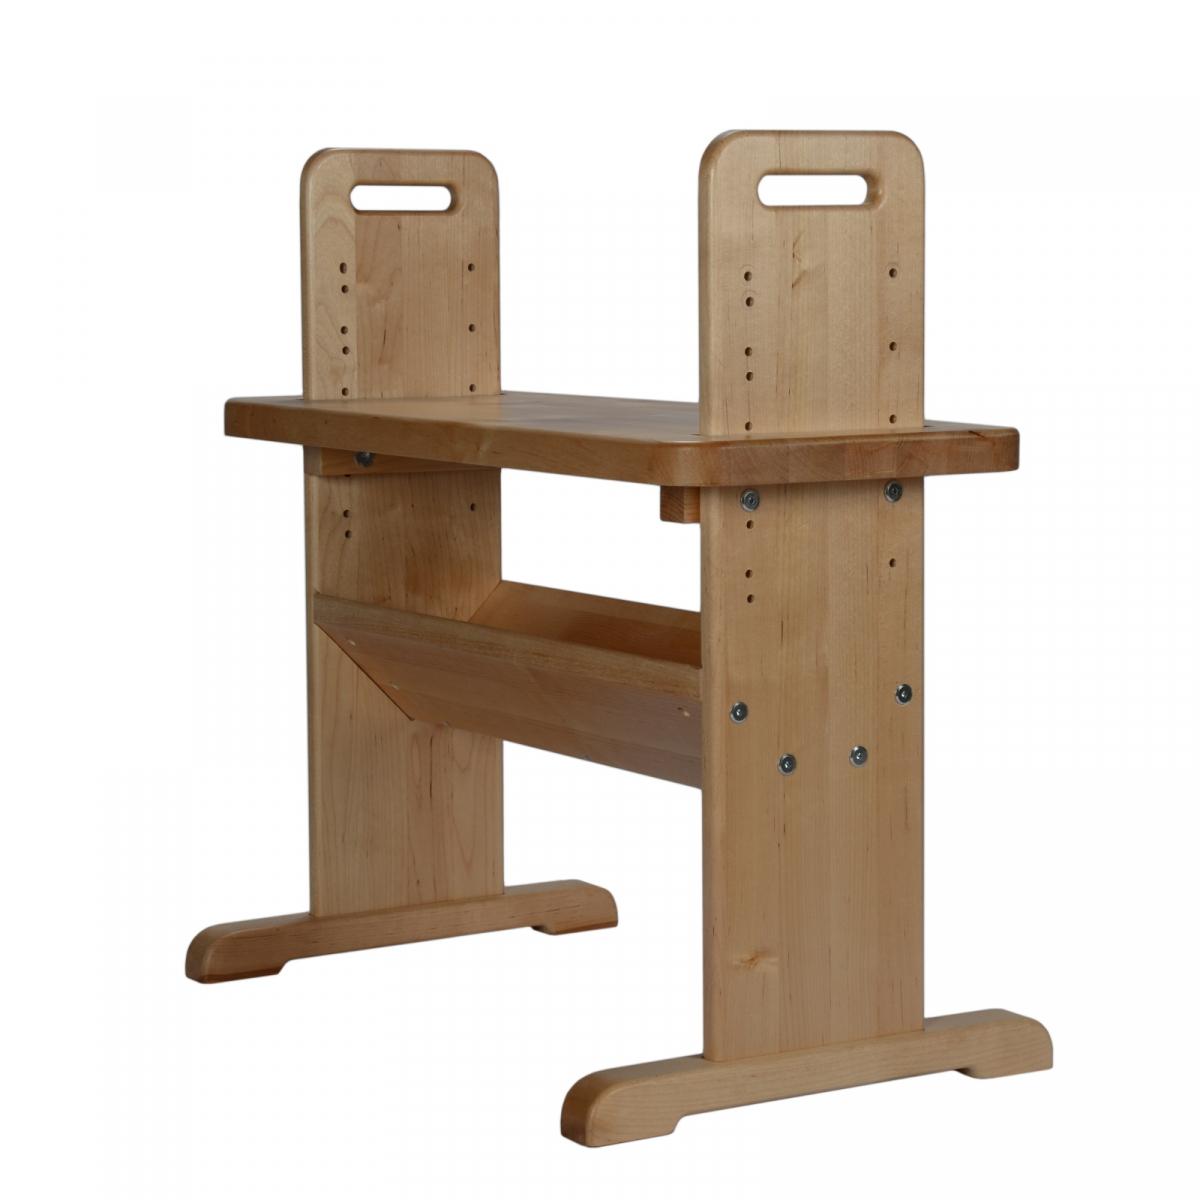 Loom bench